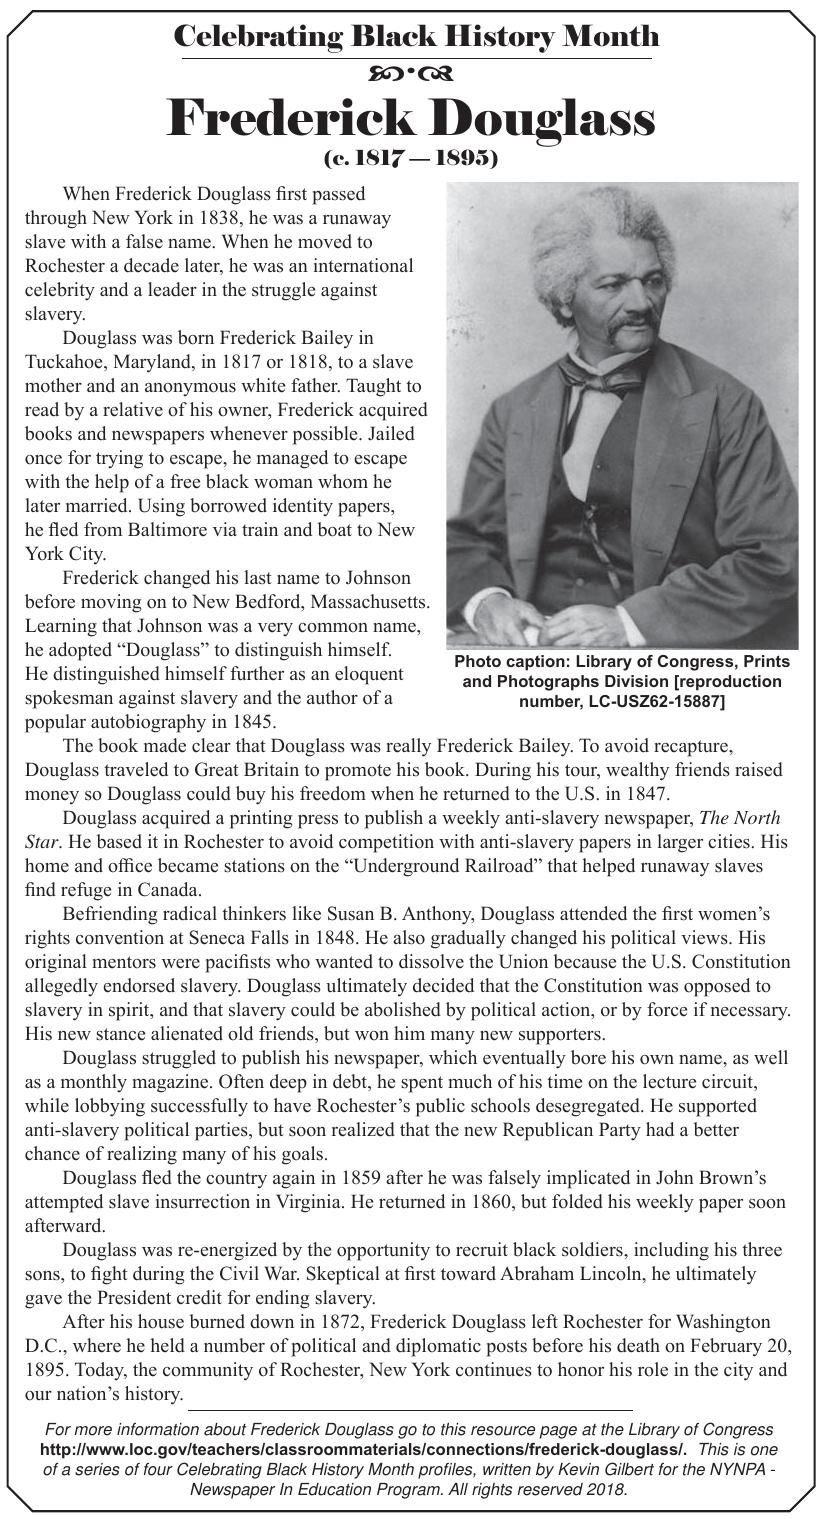 Black History Month profile: Frederick Douglass